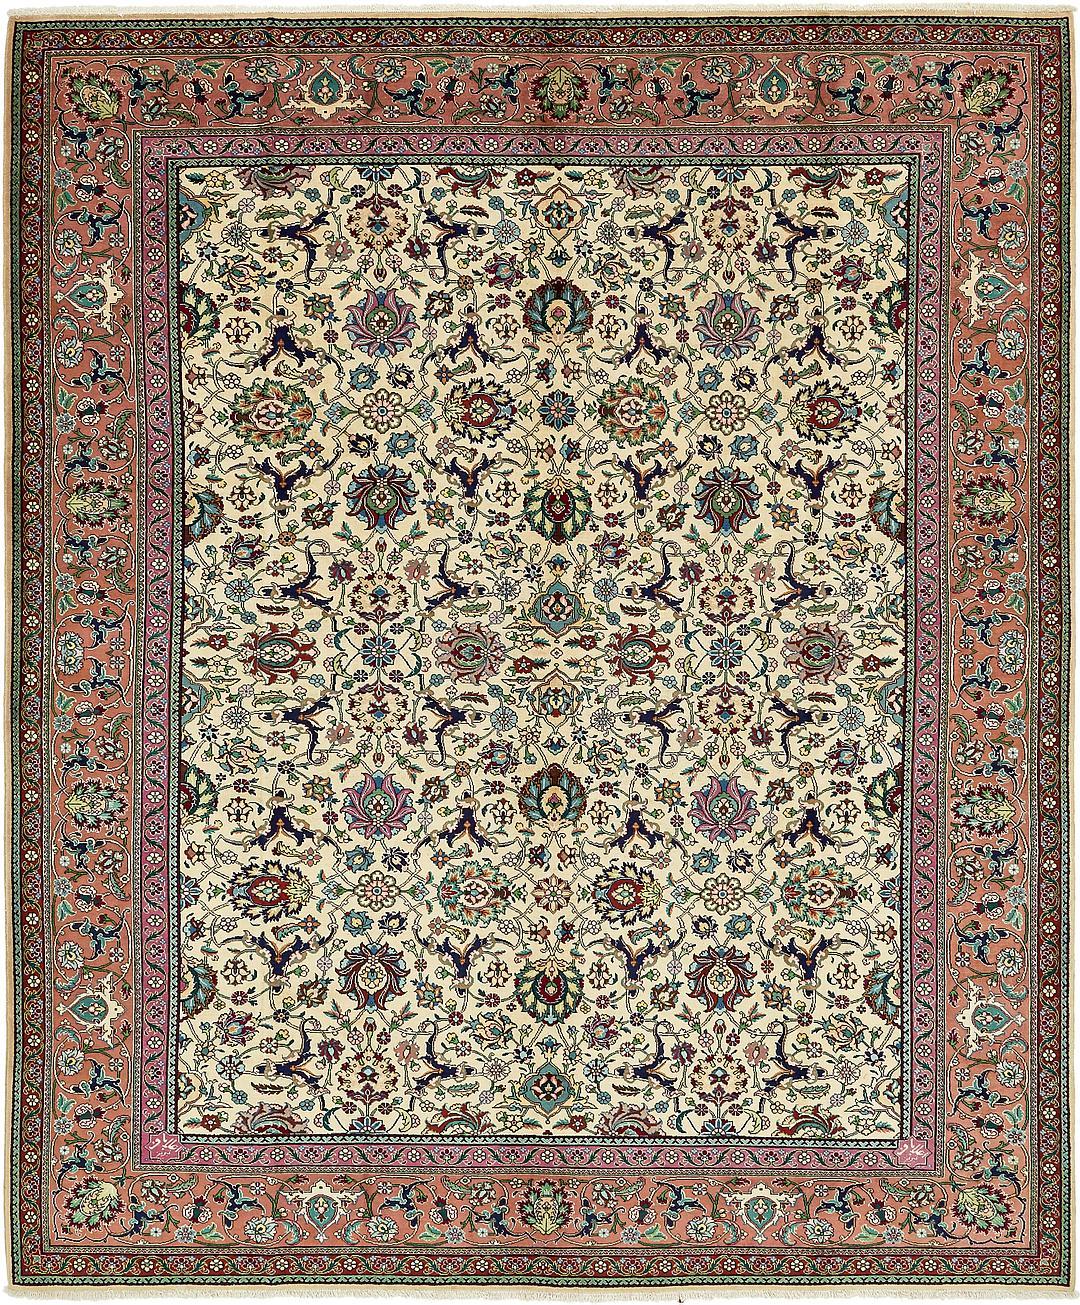 ivory 10 39 x 12 39 2 tabriz persian rug persian rugs. Black Bedroom Furniture Sets. Home Design Ideas